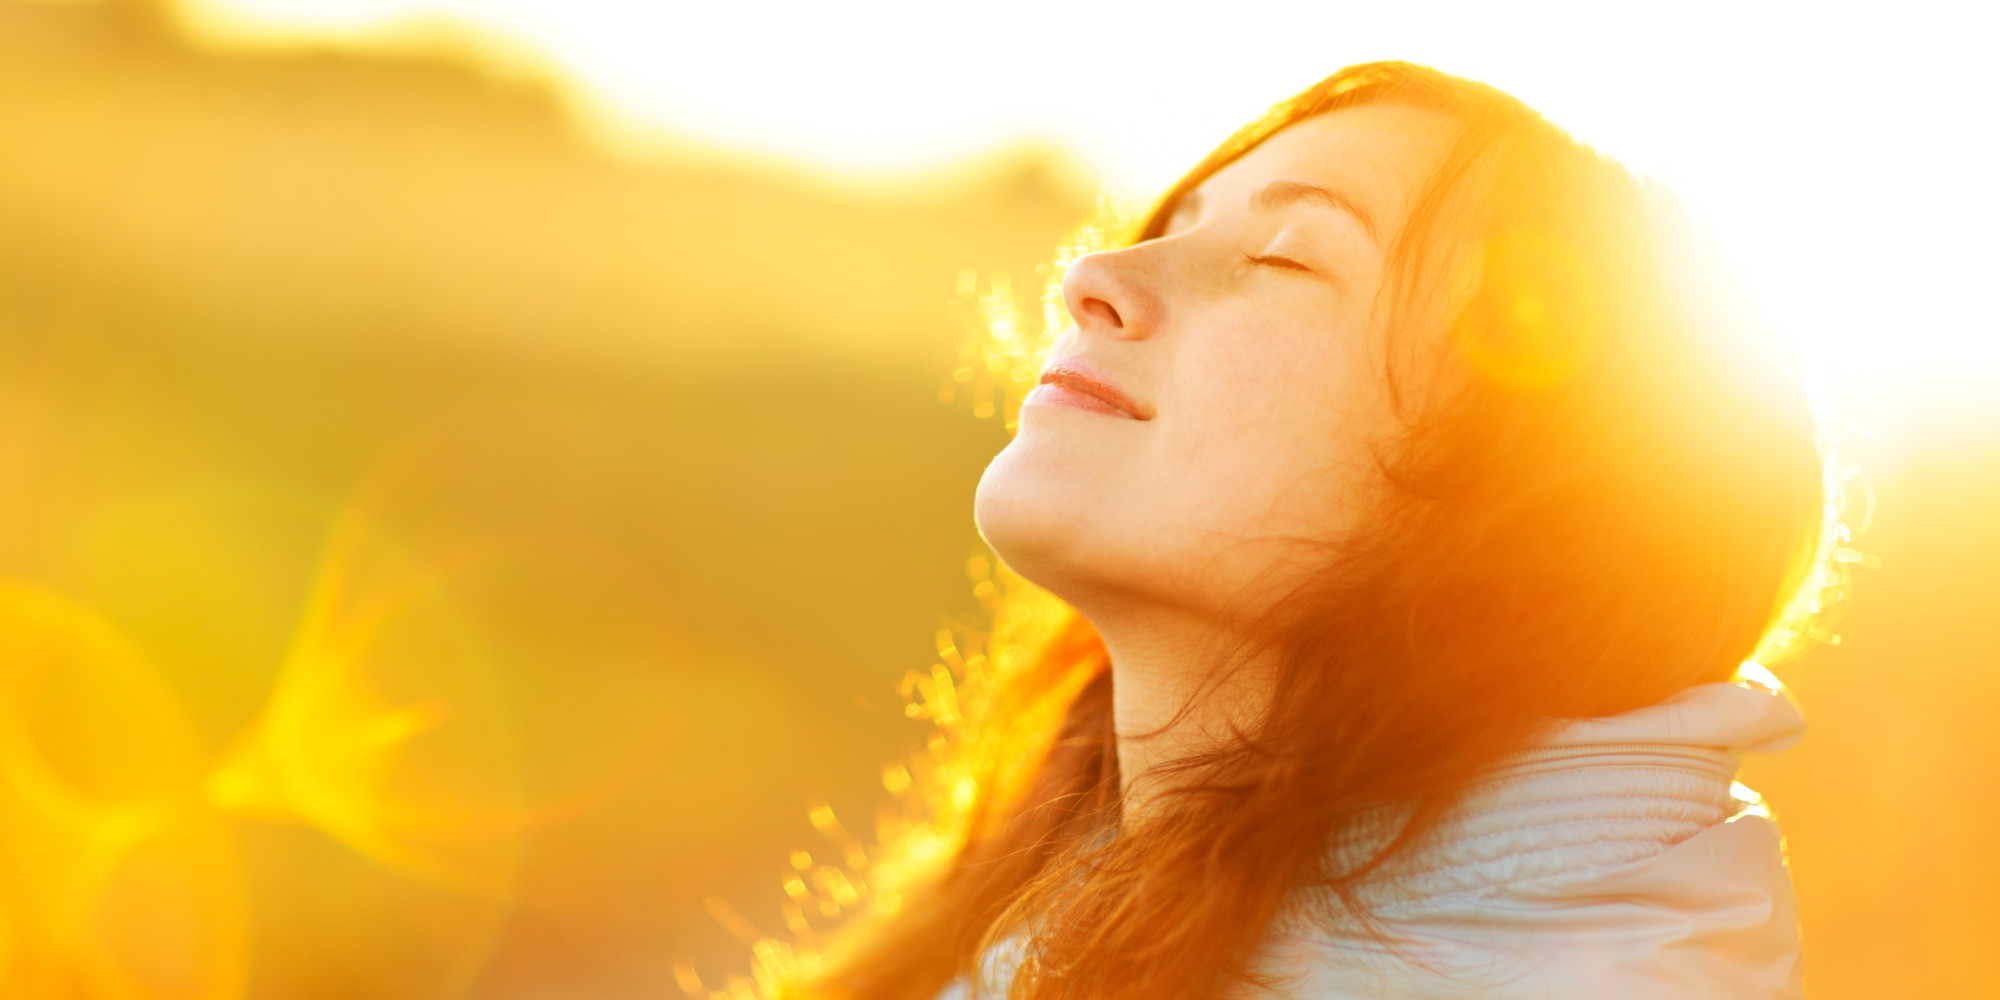 girl facing the sun